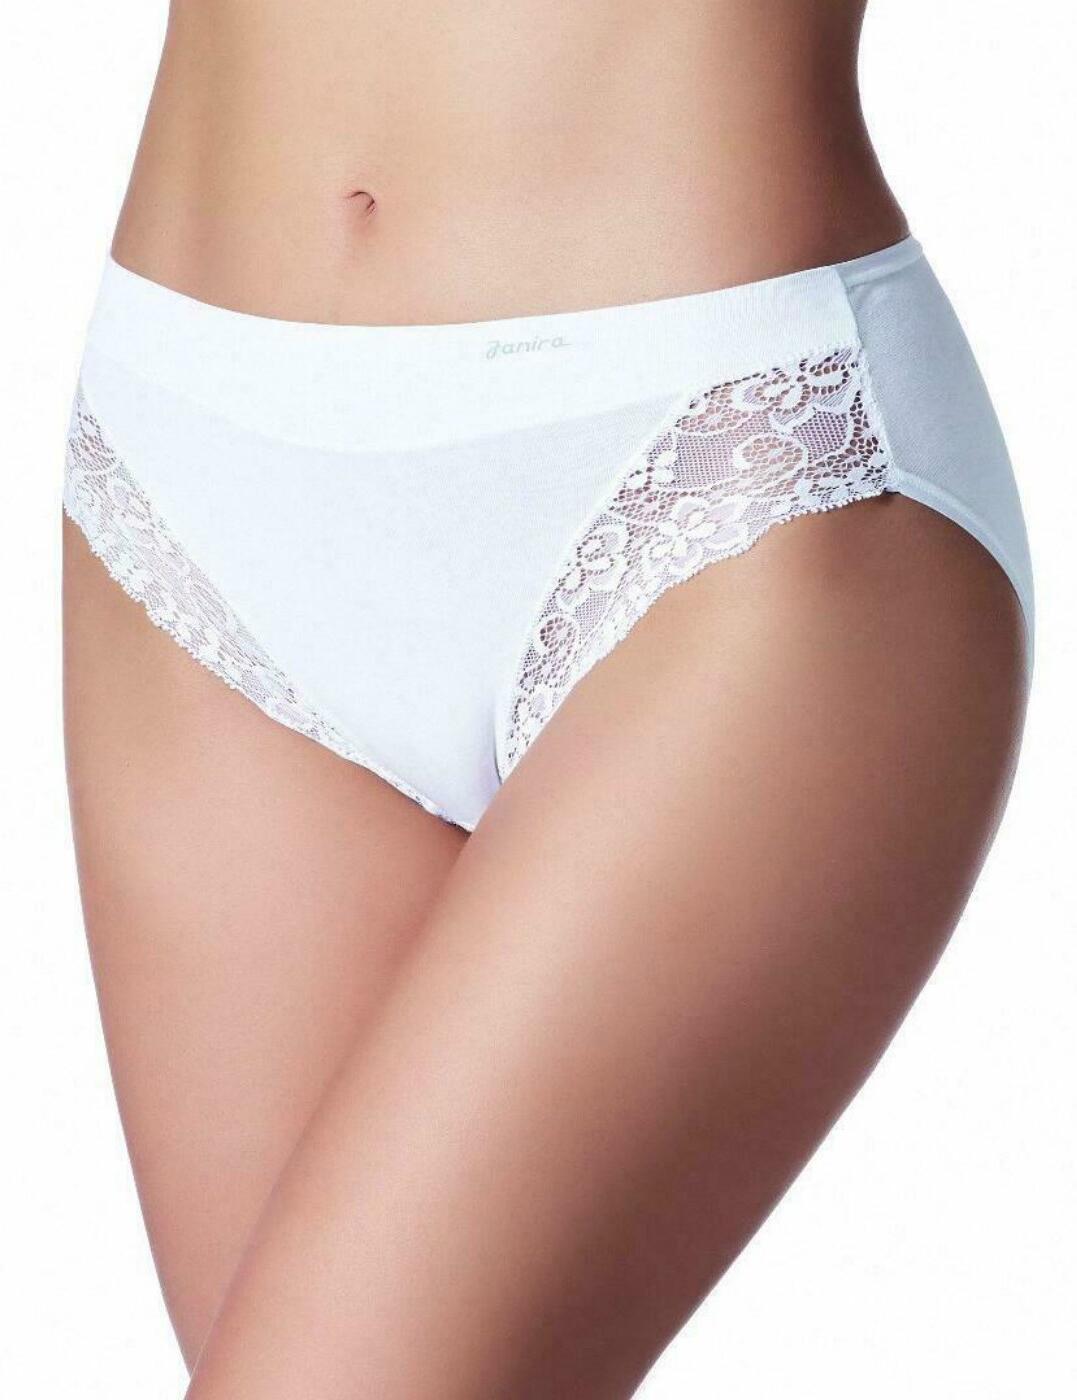 1031645 Janira Essential Milano Queen Brief 2 Pack - 1031645 White